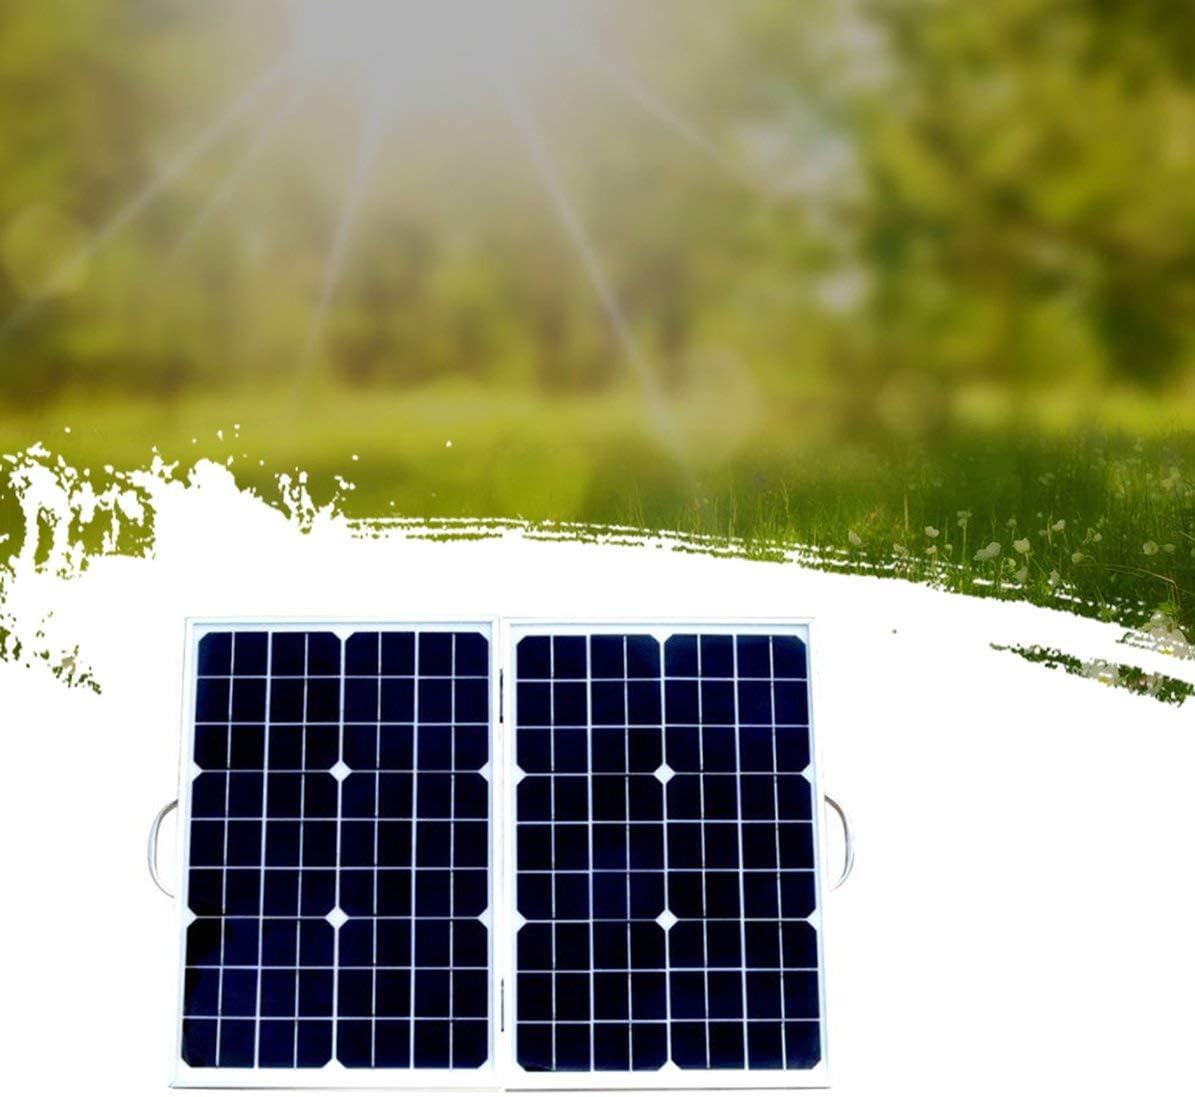 MarinoBIRD Ultra-thin Solar Mobile Power Supply Kit DIY Solar Battery Charger Storage Box Power Bank Case-Black